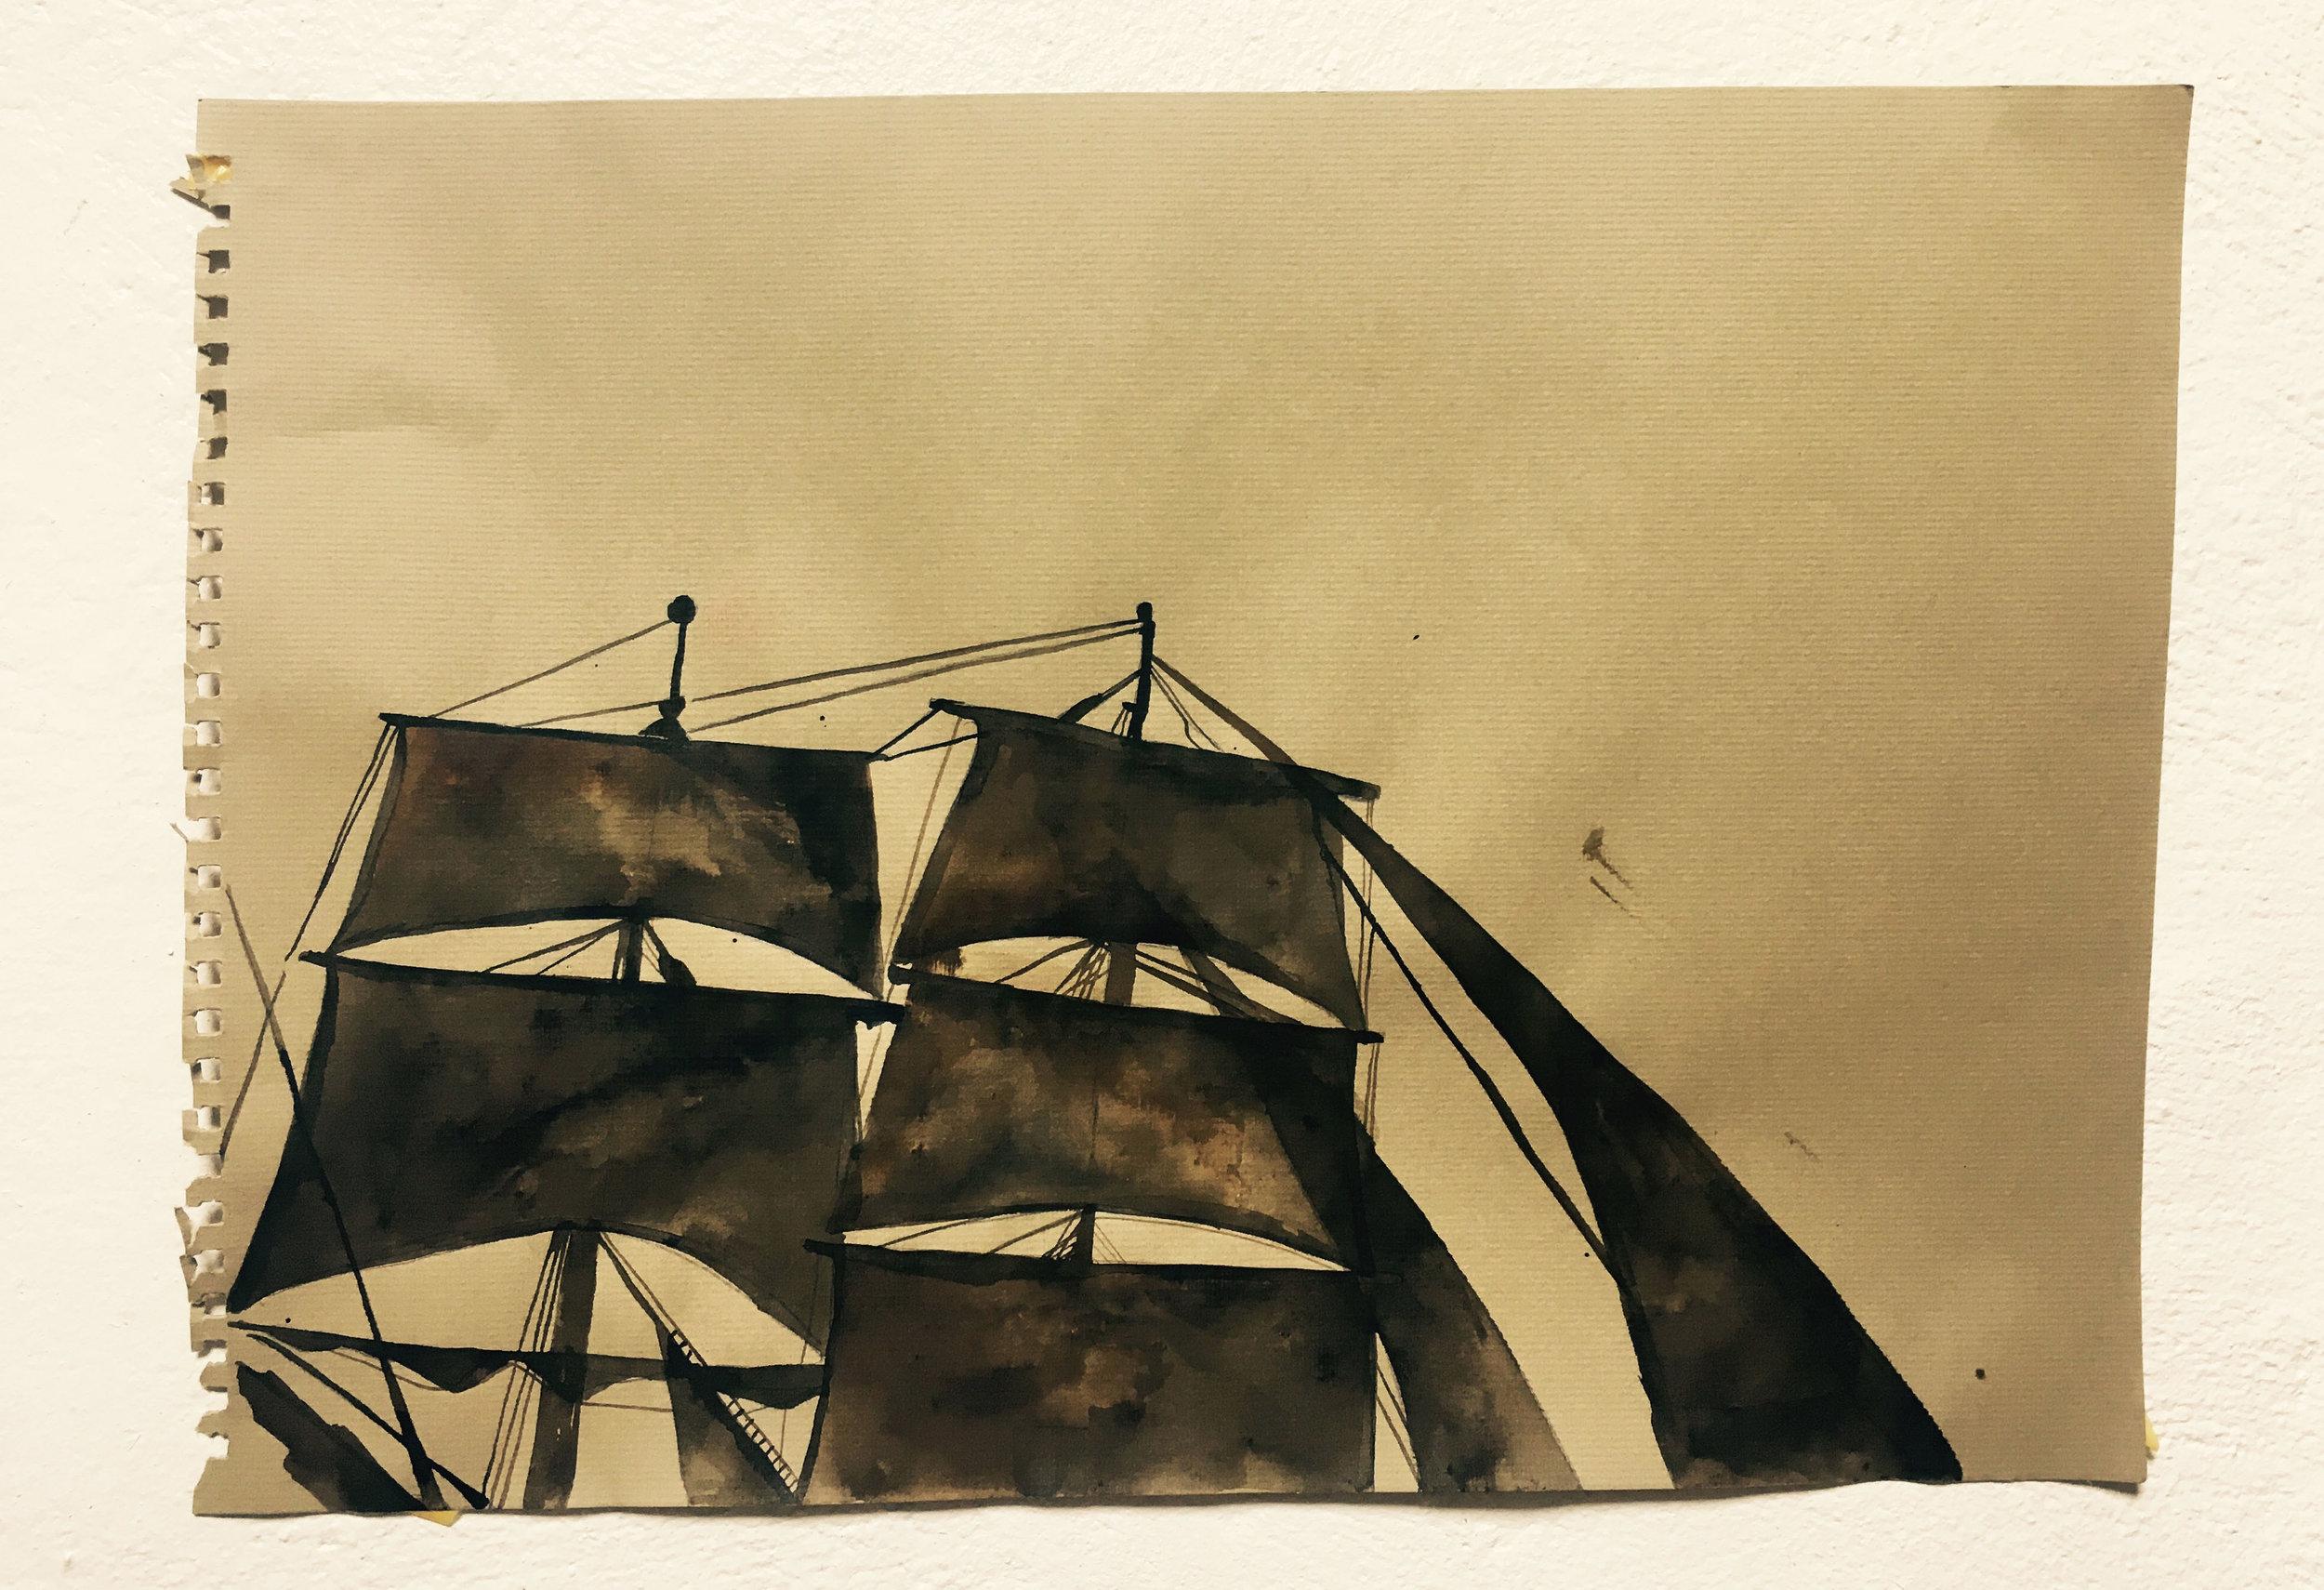 blk_sails.jpg